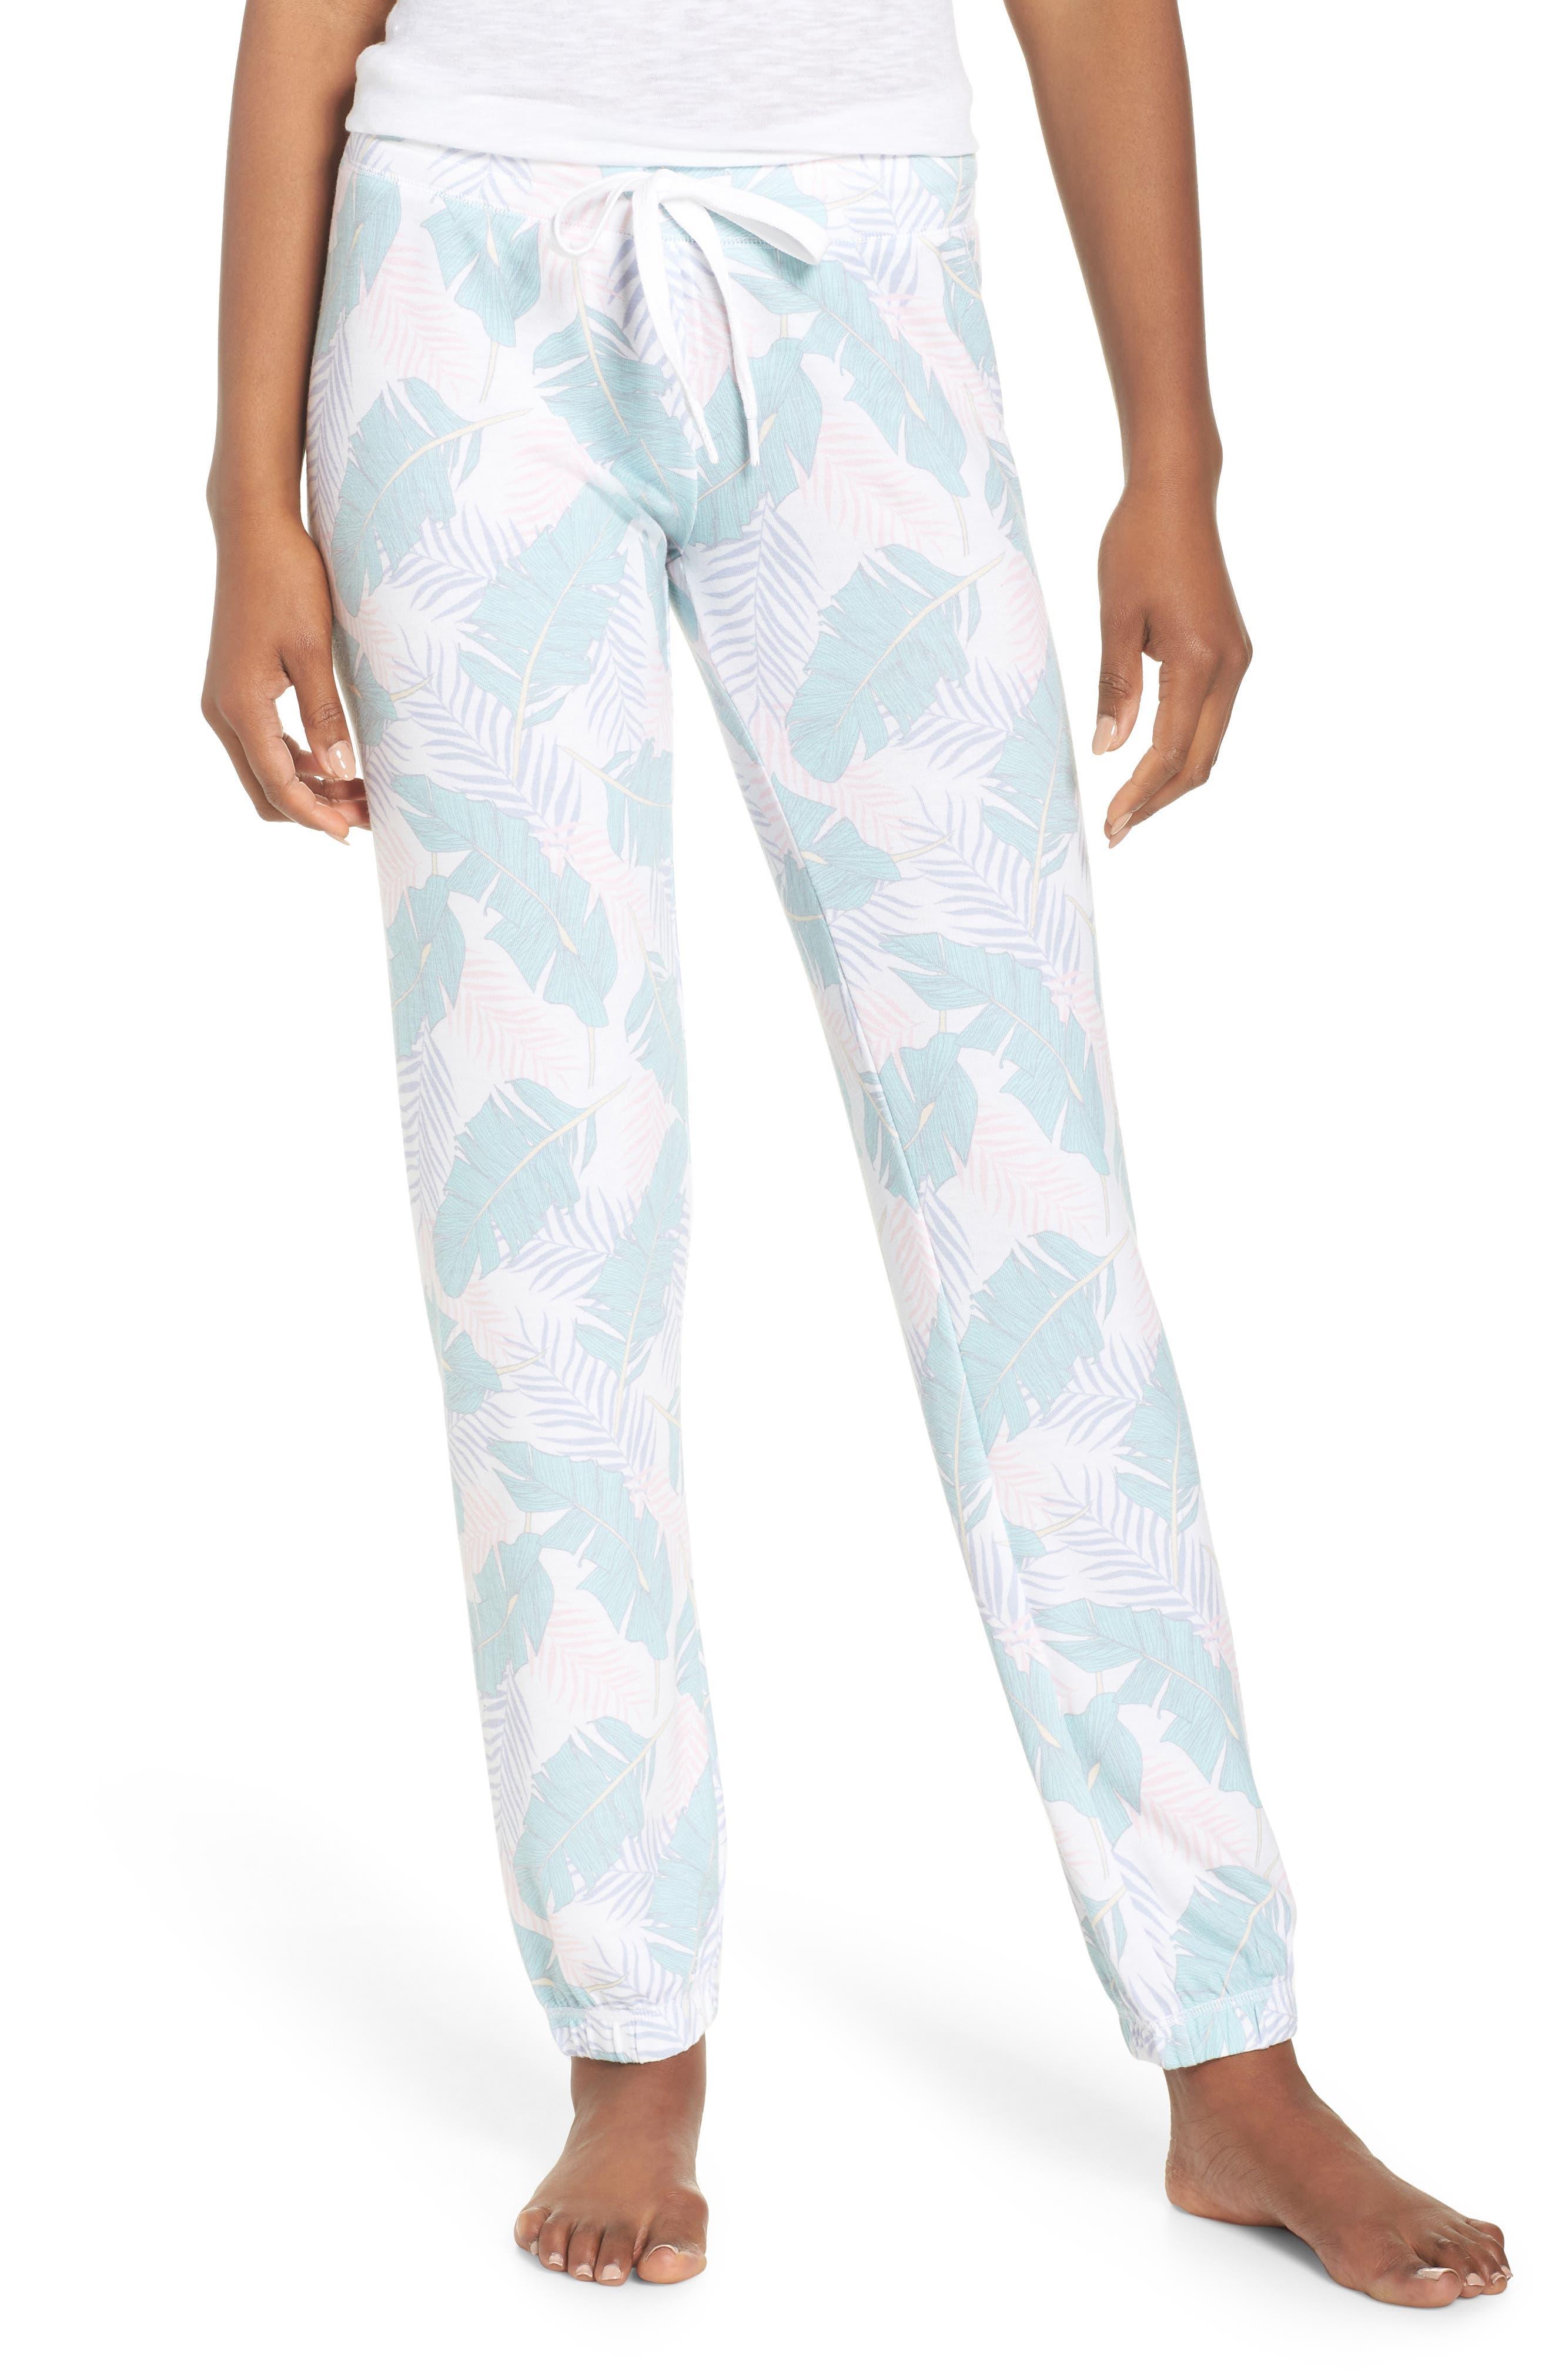 Peachy Jogger Lounge Pants,                         Main,                         color, 100